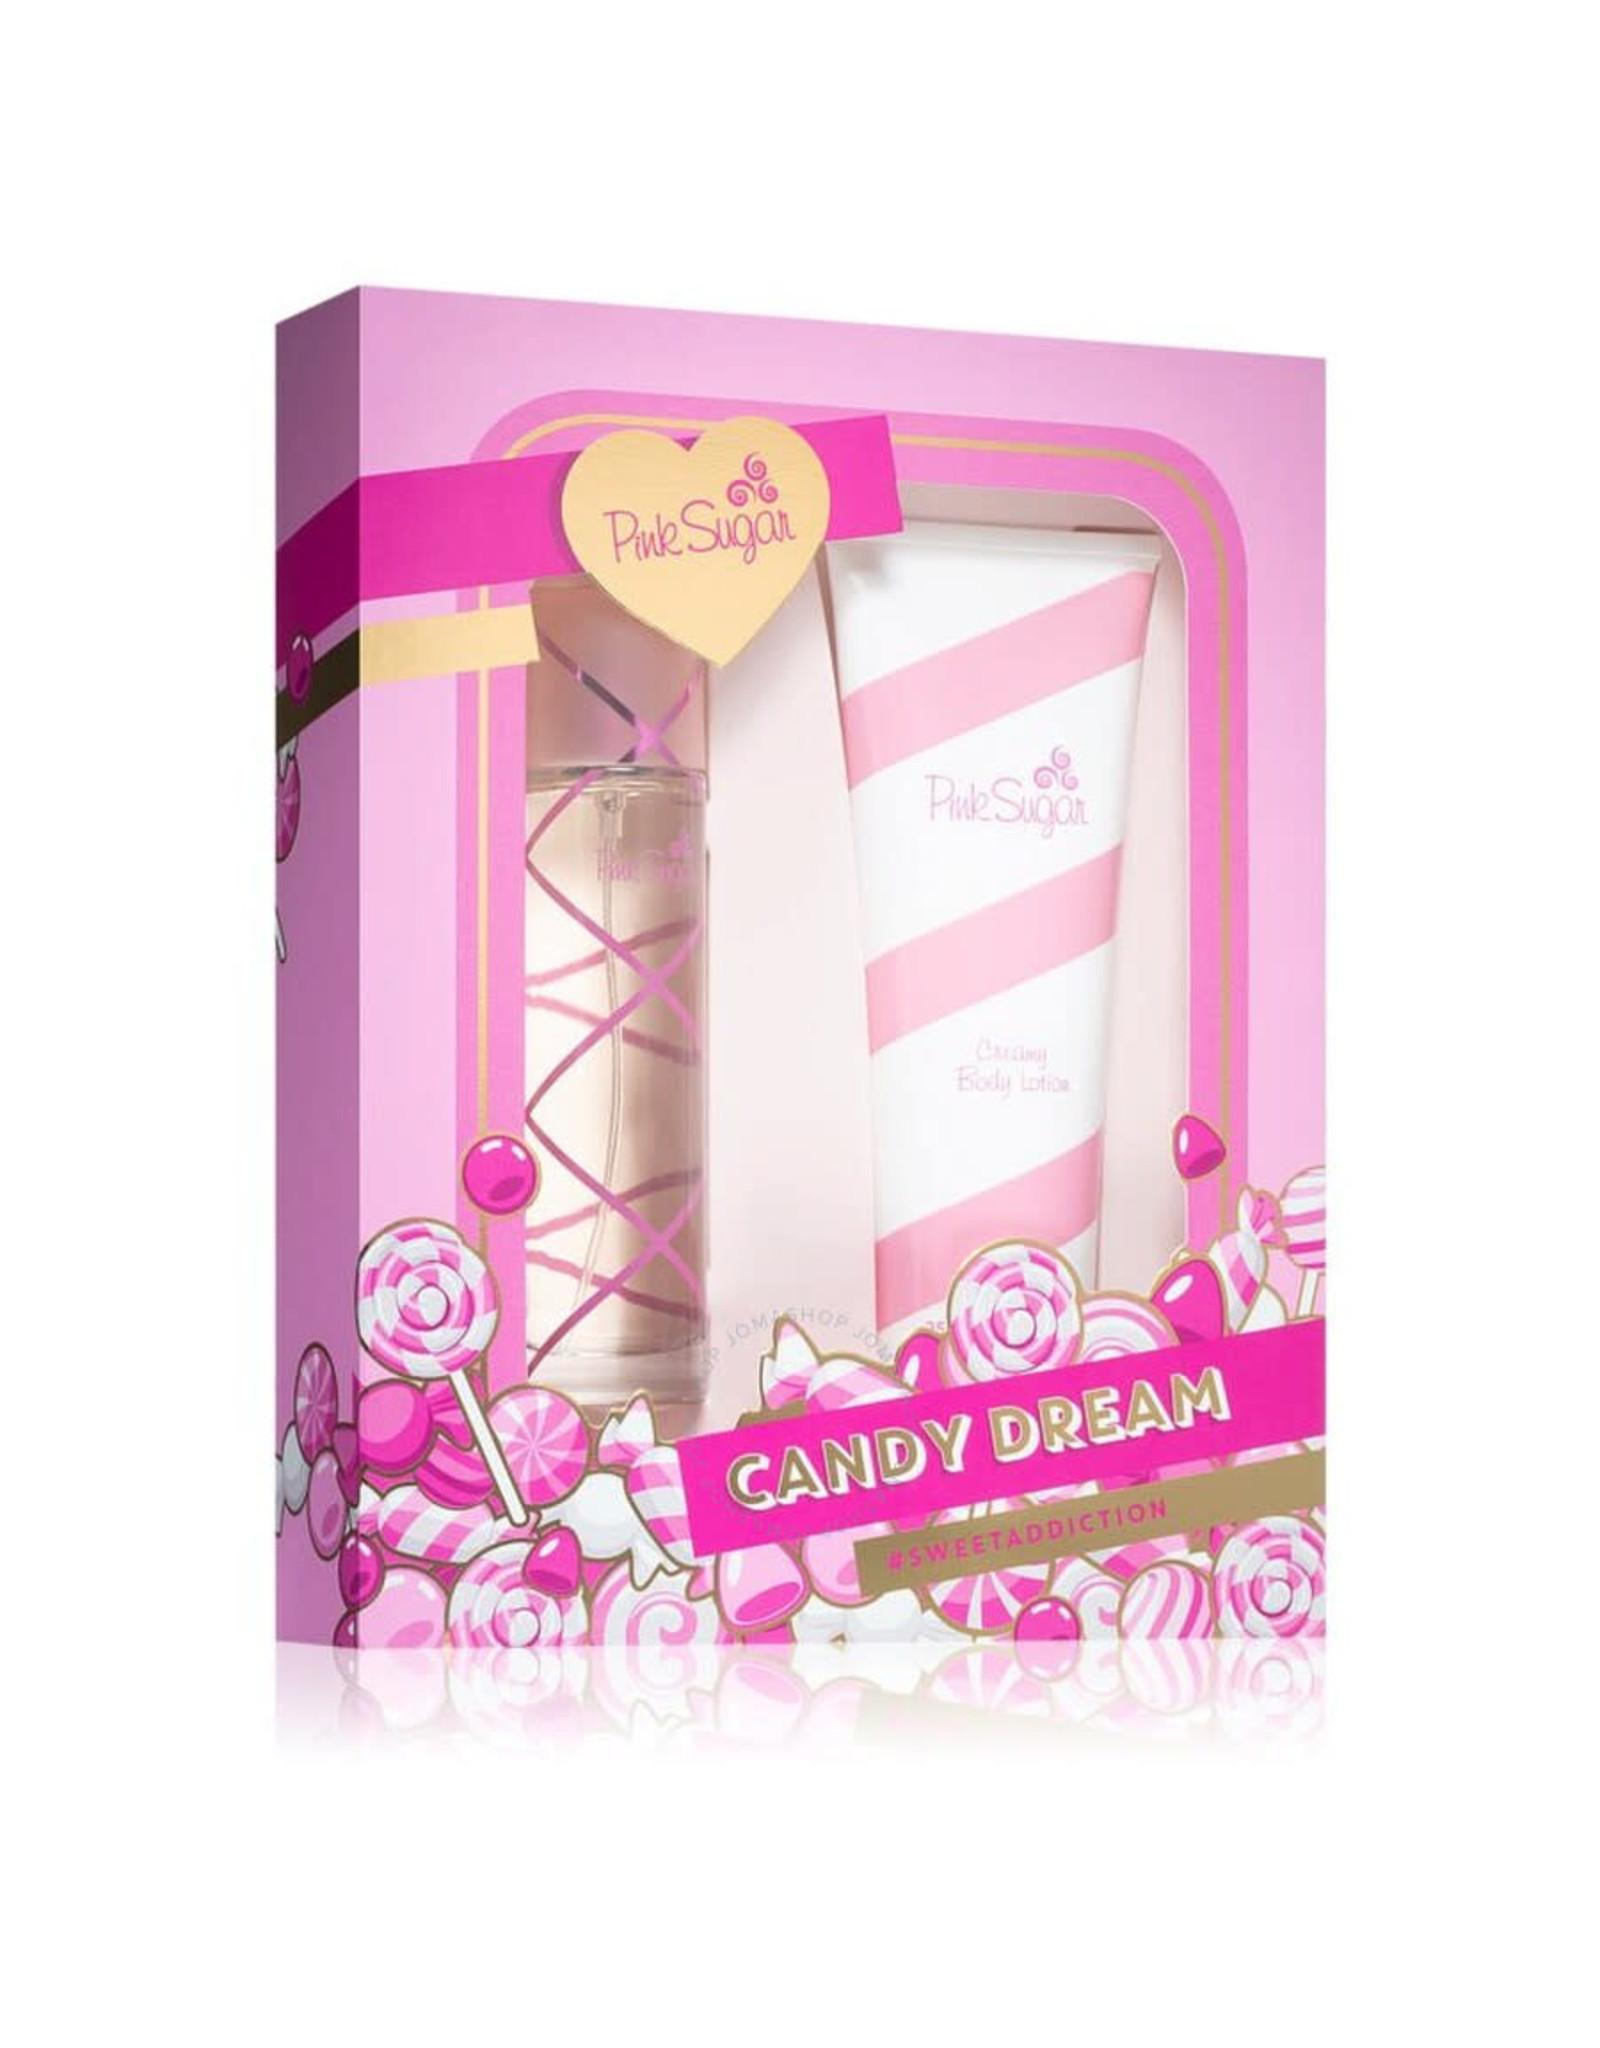 AQUOLINA PINK SUGAR CANDY CREAM SWEET ADDICTION 2pc Set